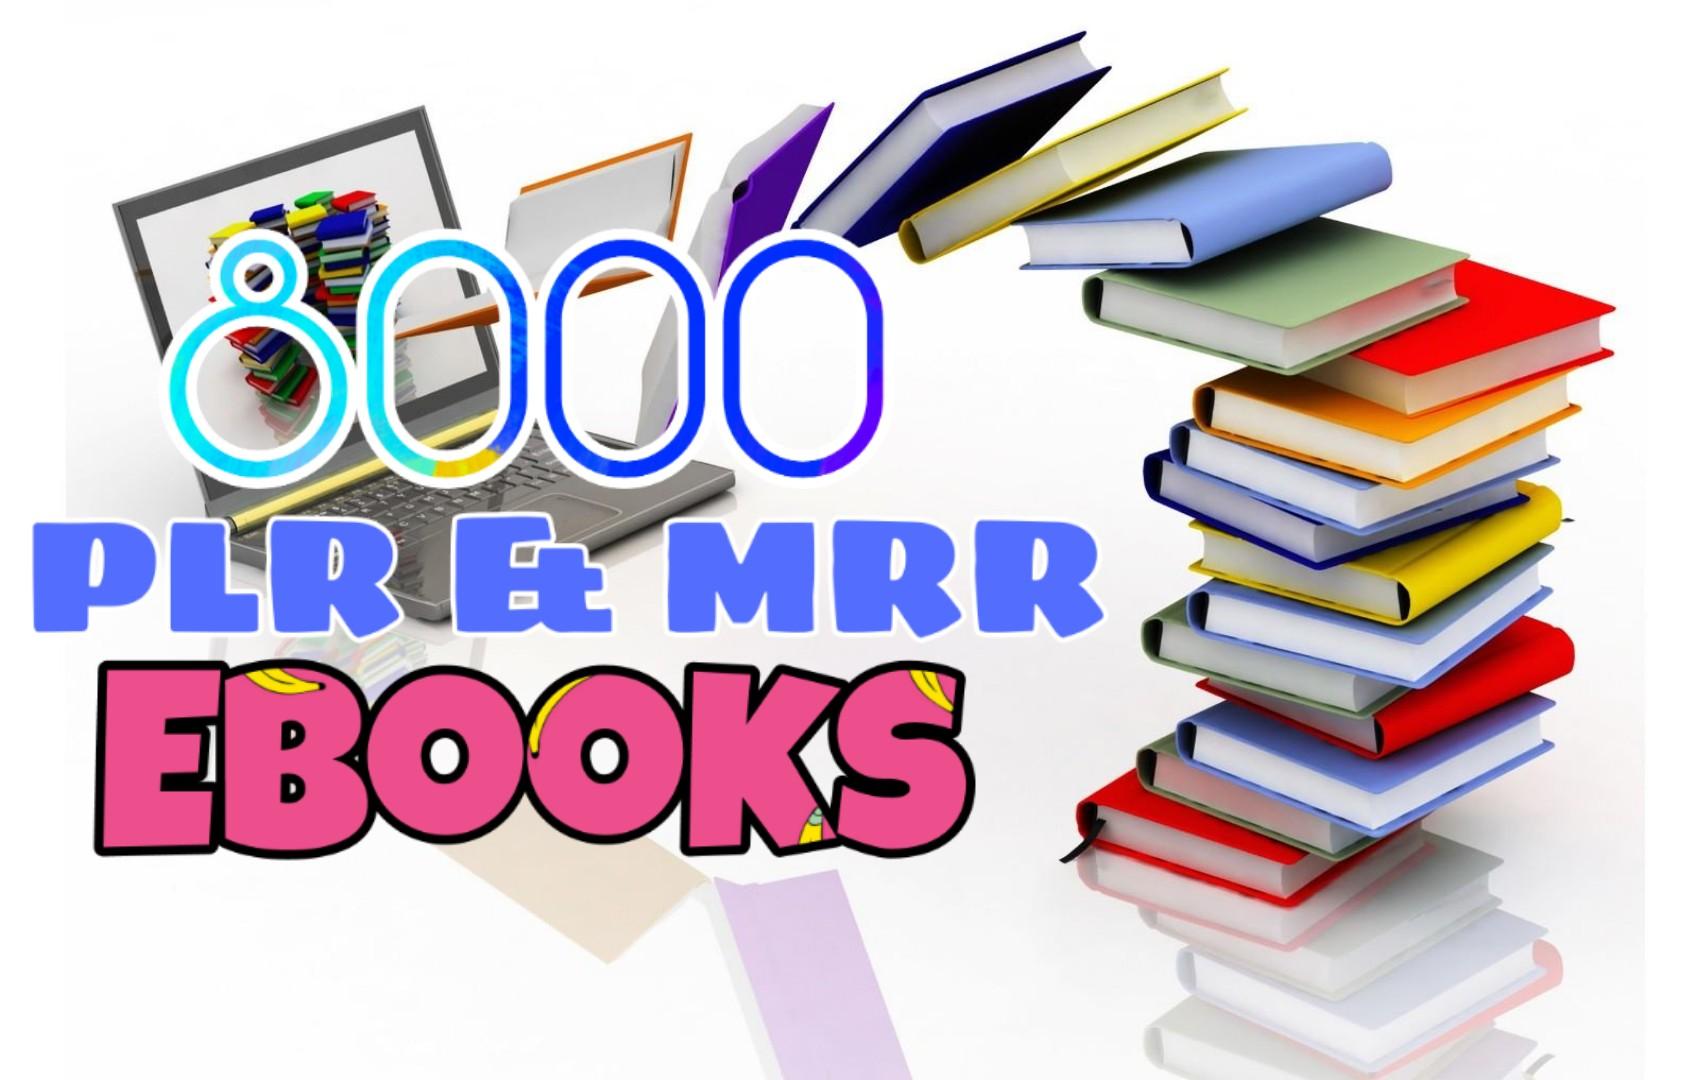 6000+ multi-niche eBooks with private label and master resale rights